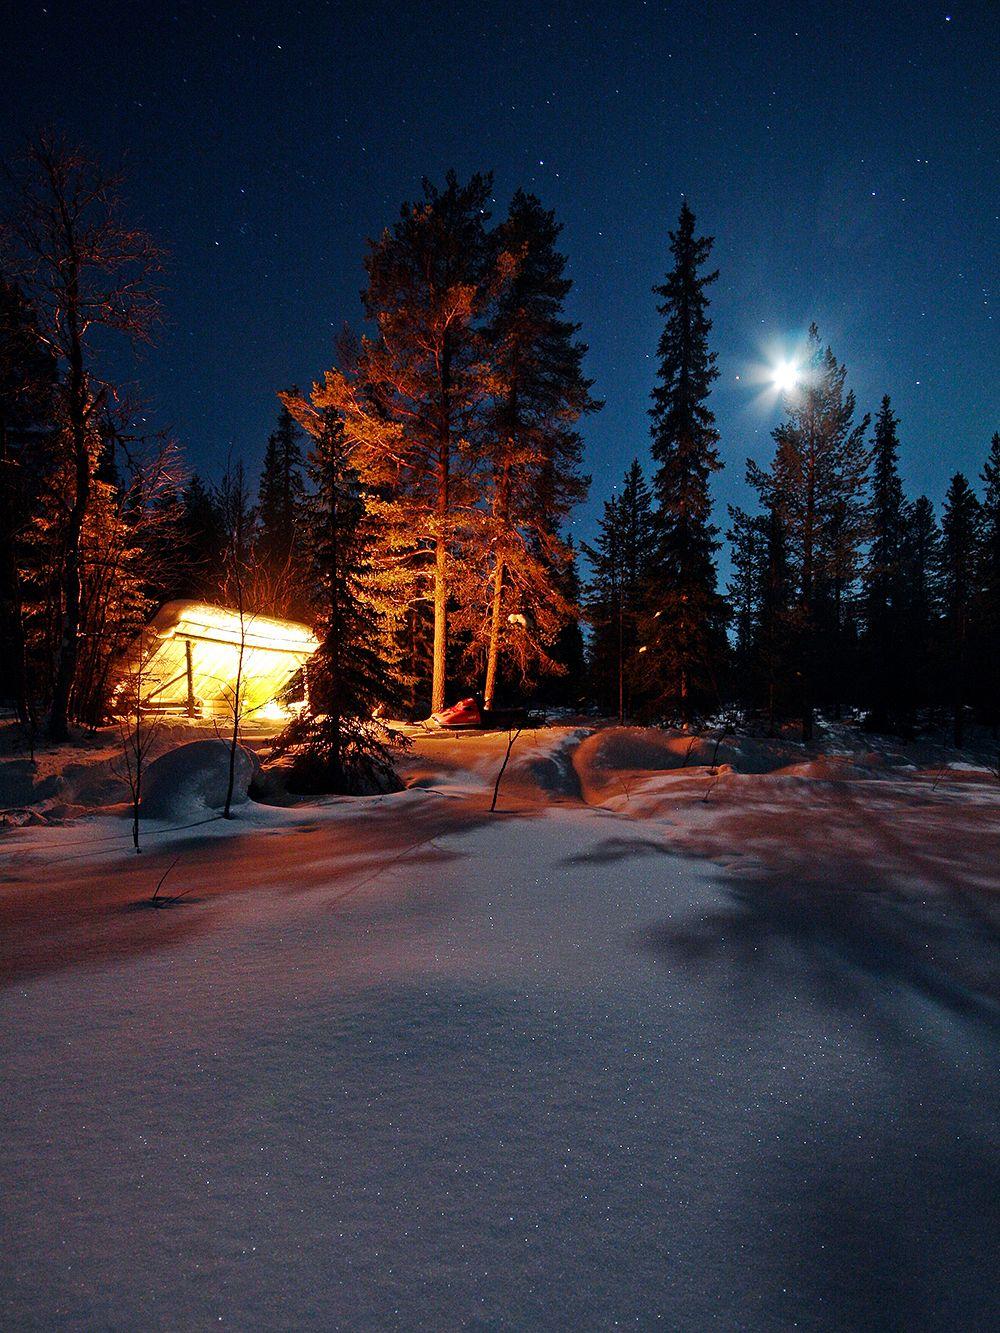 Sleeping outdoors in winter